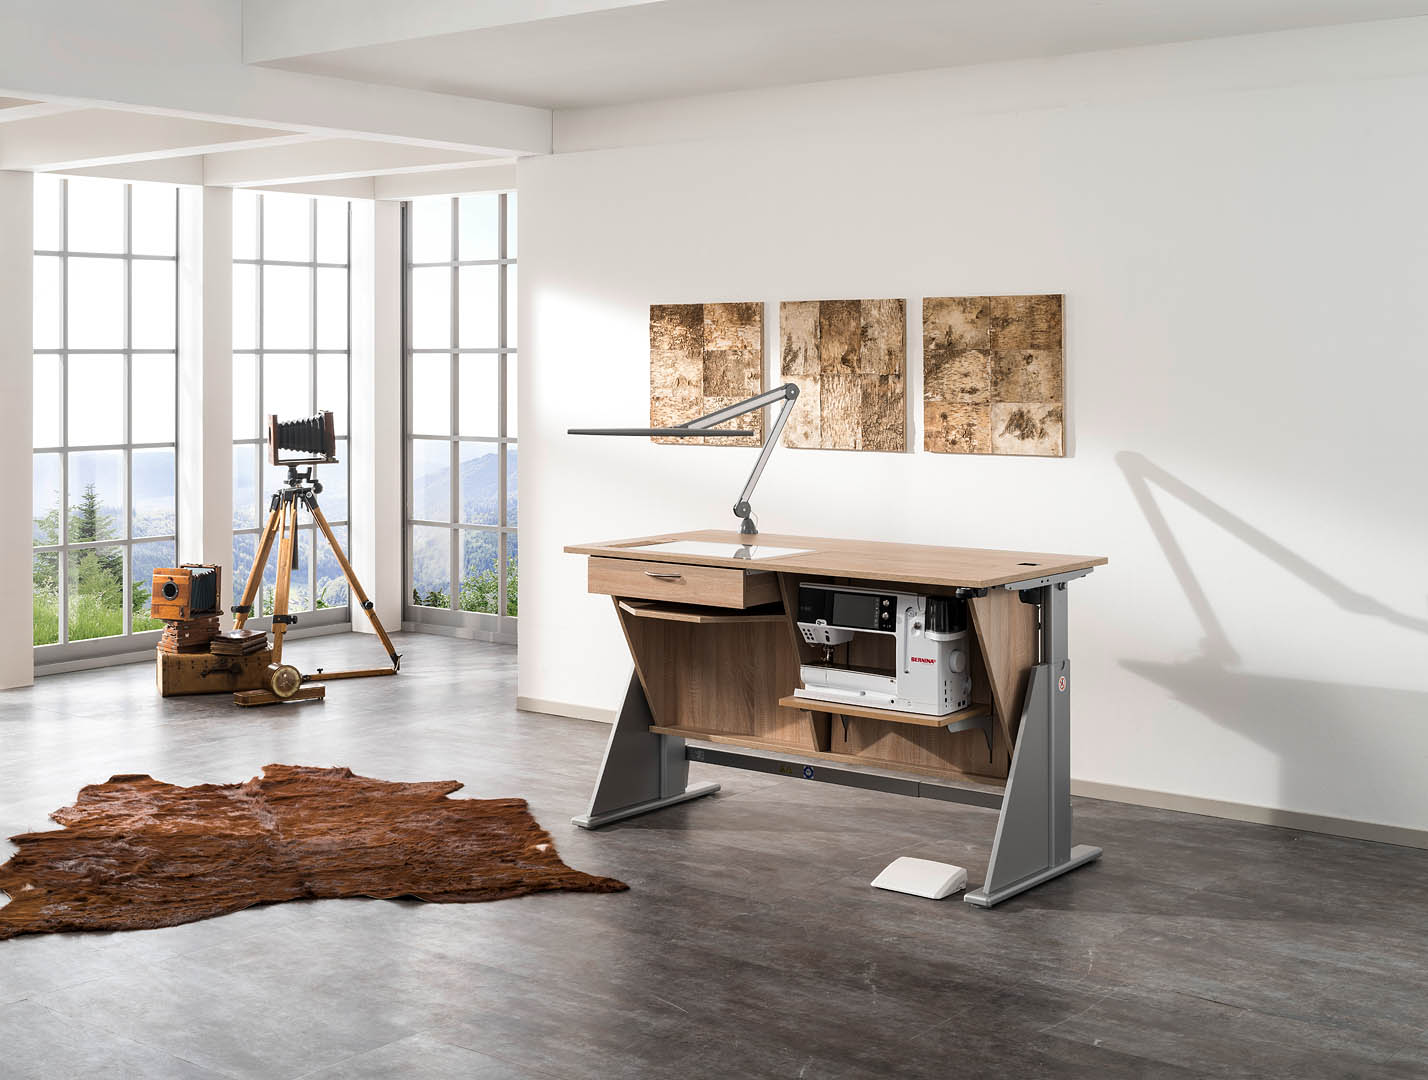 multi great mit neuem elektronischen easy softtech lift n hwelt flach. Black Bedroom Furniture Sets. Home Design Ideas